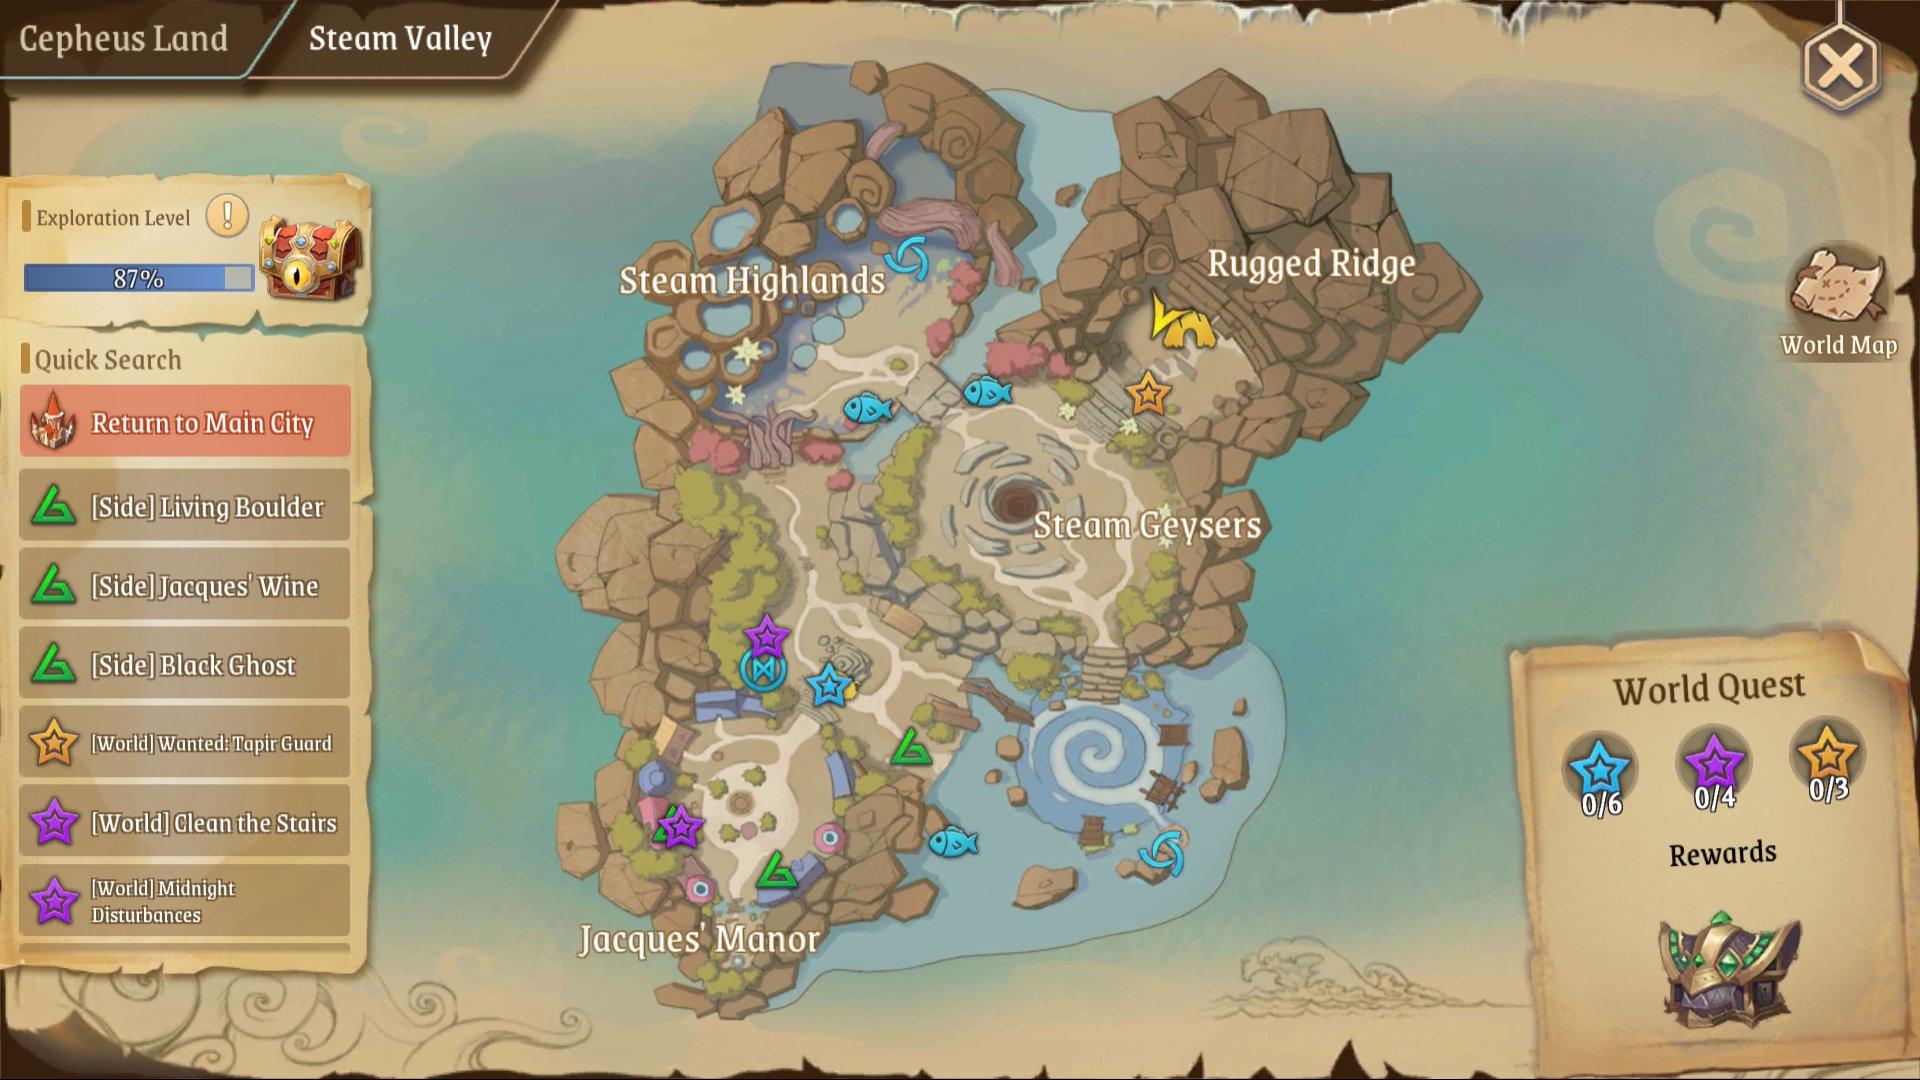 Treasure Map (L) 2: Steam Valley top near Steamy Cave entrance portal